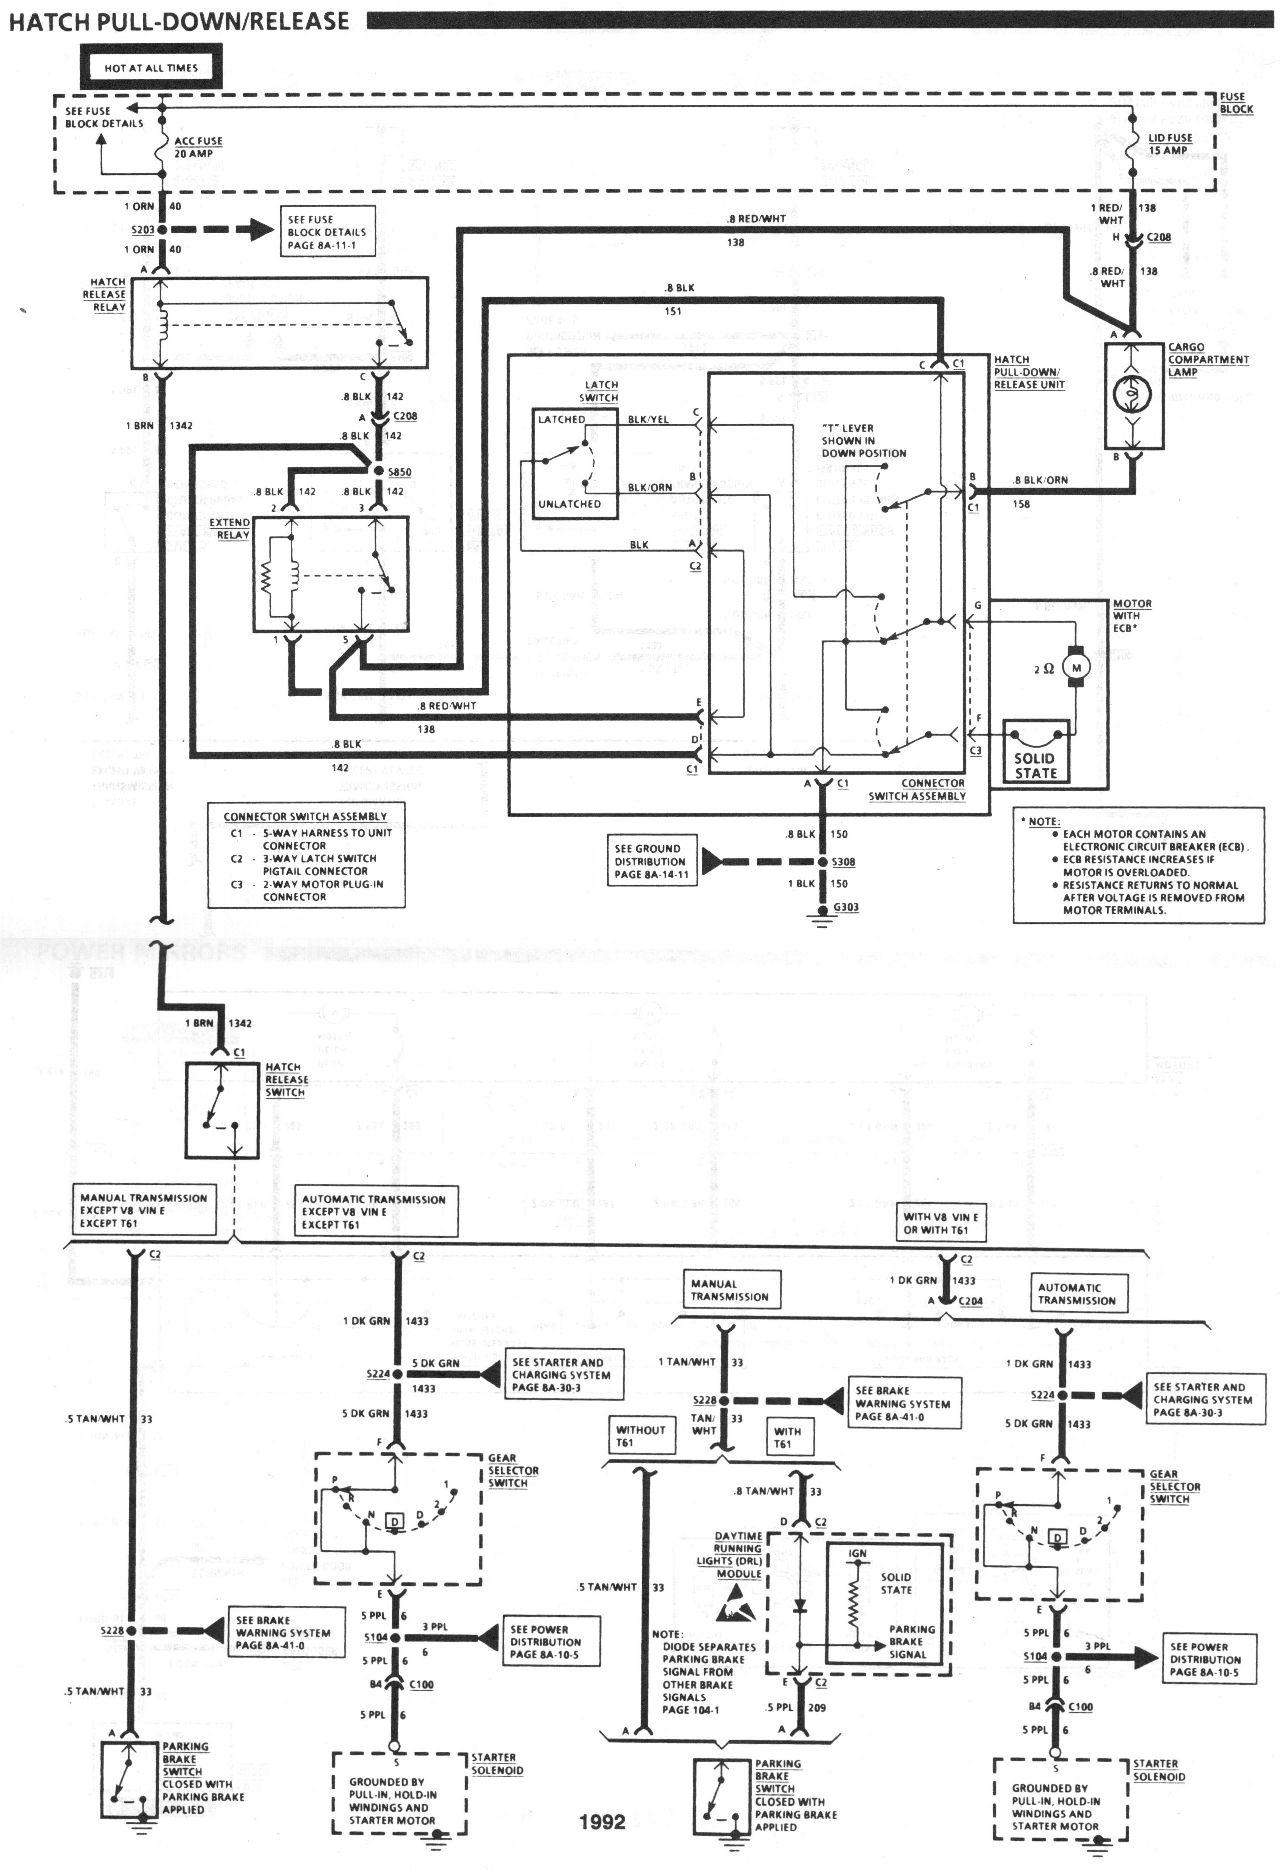 nf_7574] 1992 camaro cooling fan wiring diagram schematic wiring  pap siry magn feren drosi numap mohammedshrine librar wiring 101